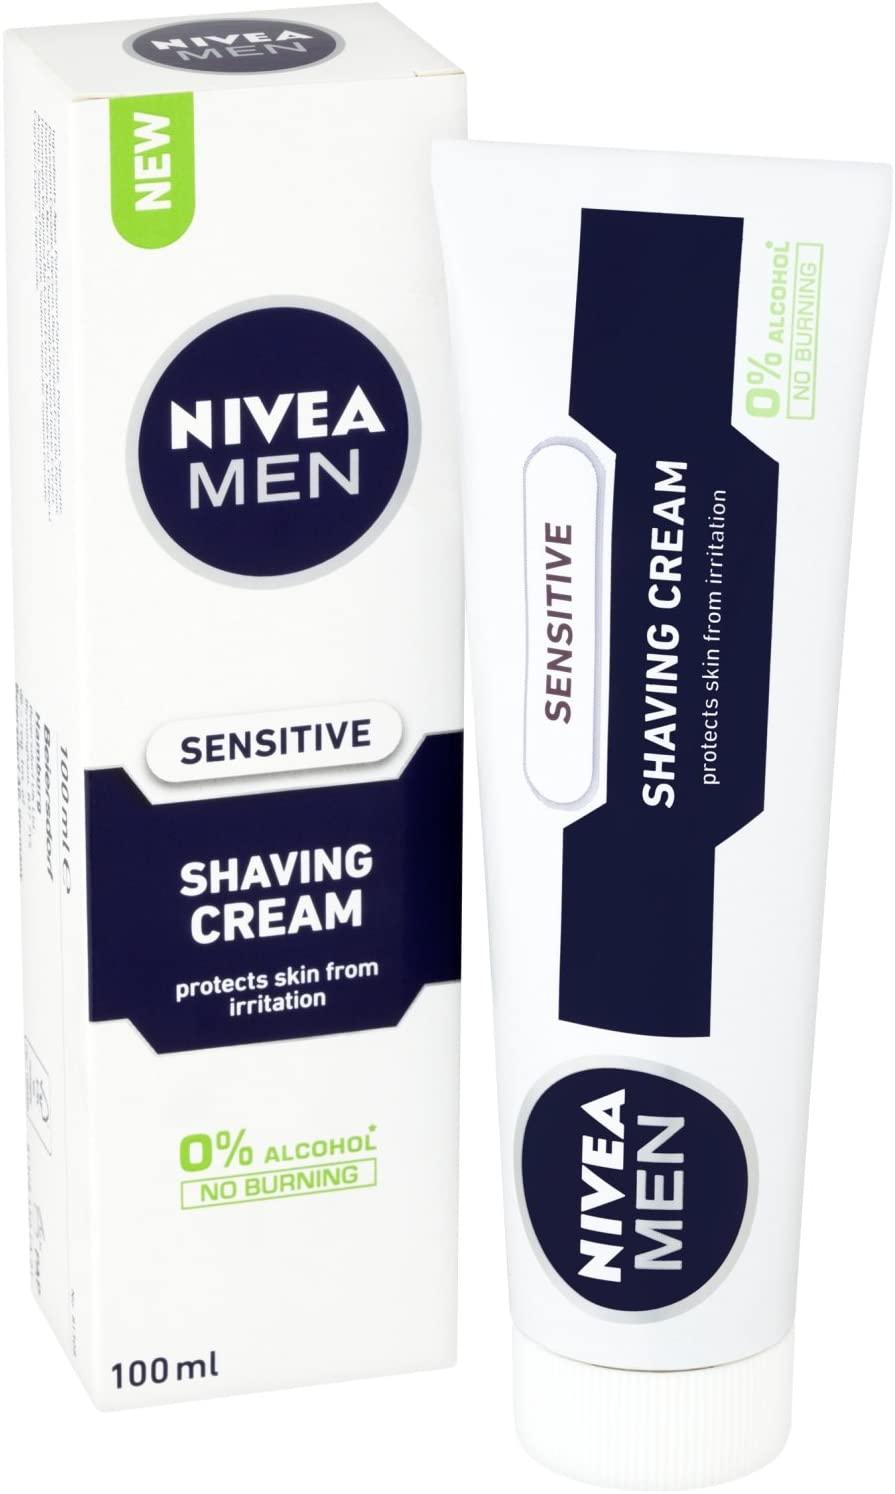 81308 Nivea Men Sensitive Shaving Cream for Men, 100 ml